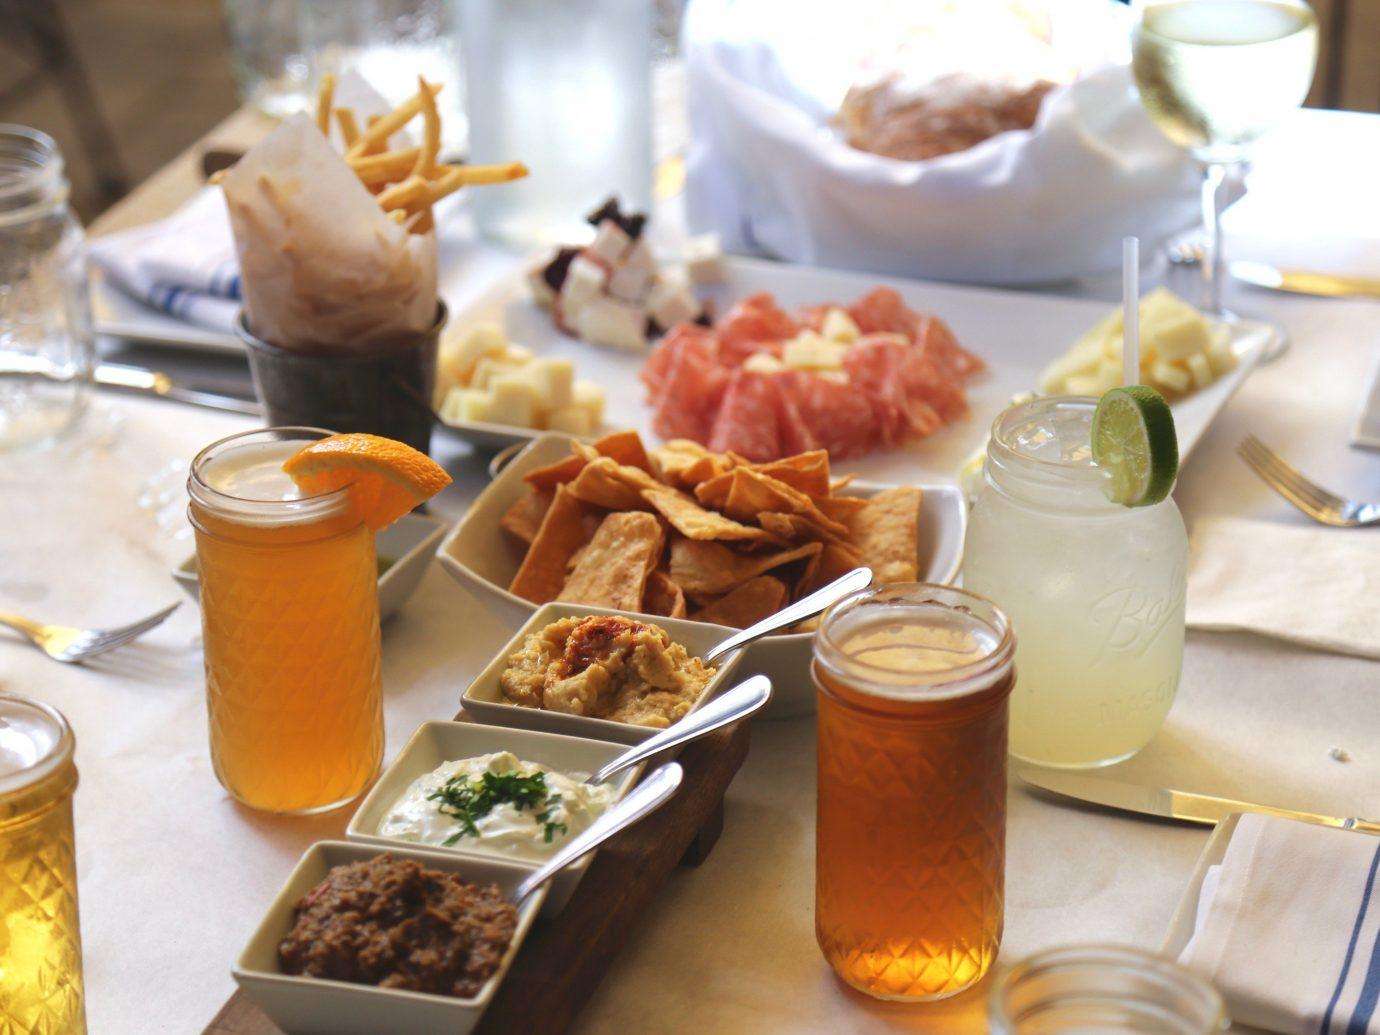 Trip Ideas table food cup plate meal dish brunch breakfast lunch supper restaurant sense Drink cuisine dinner